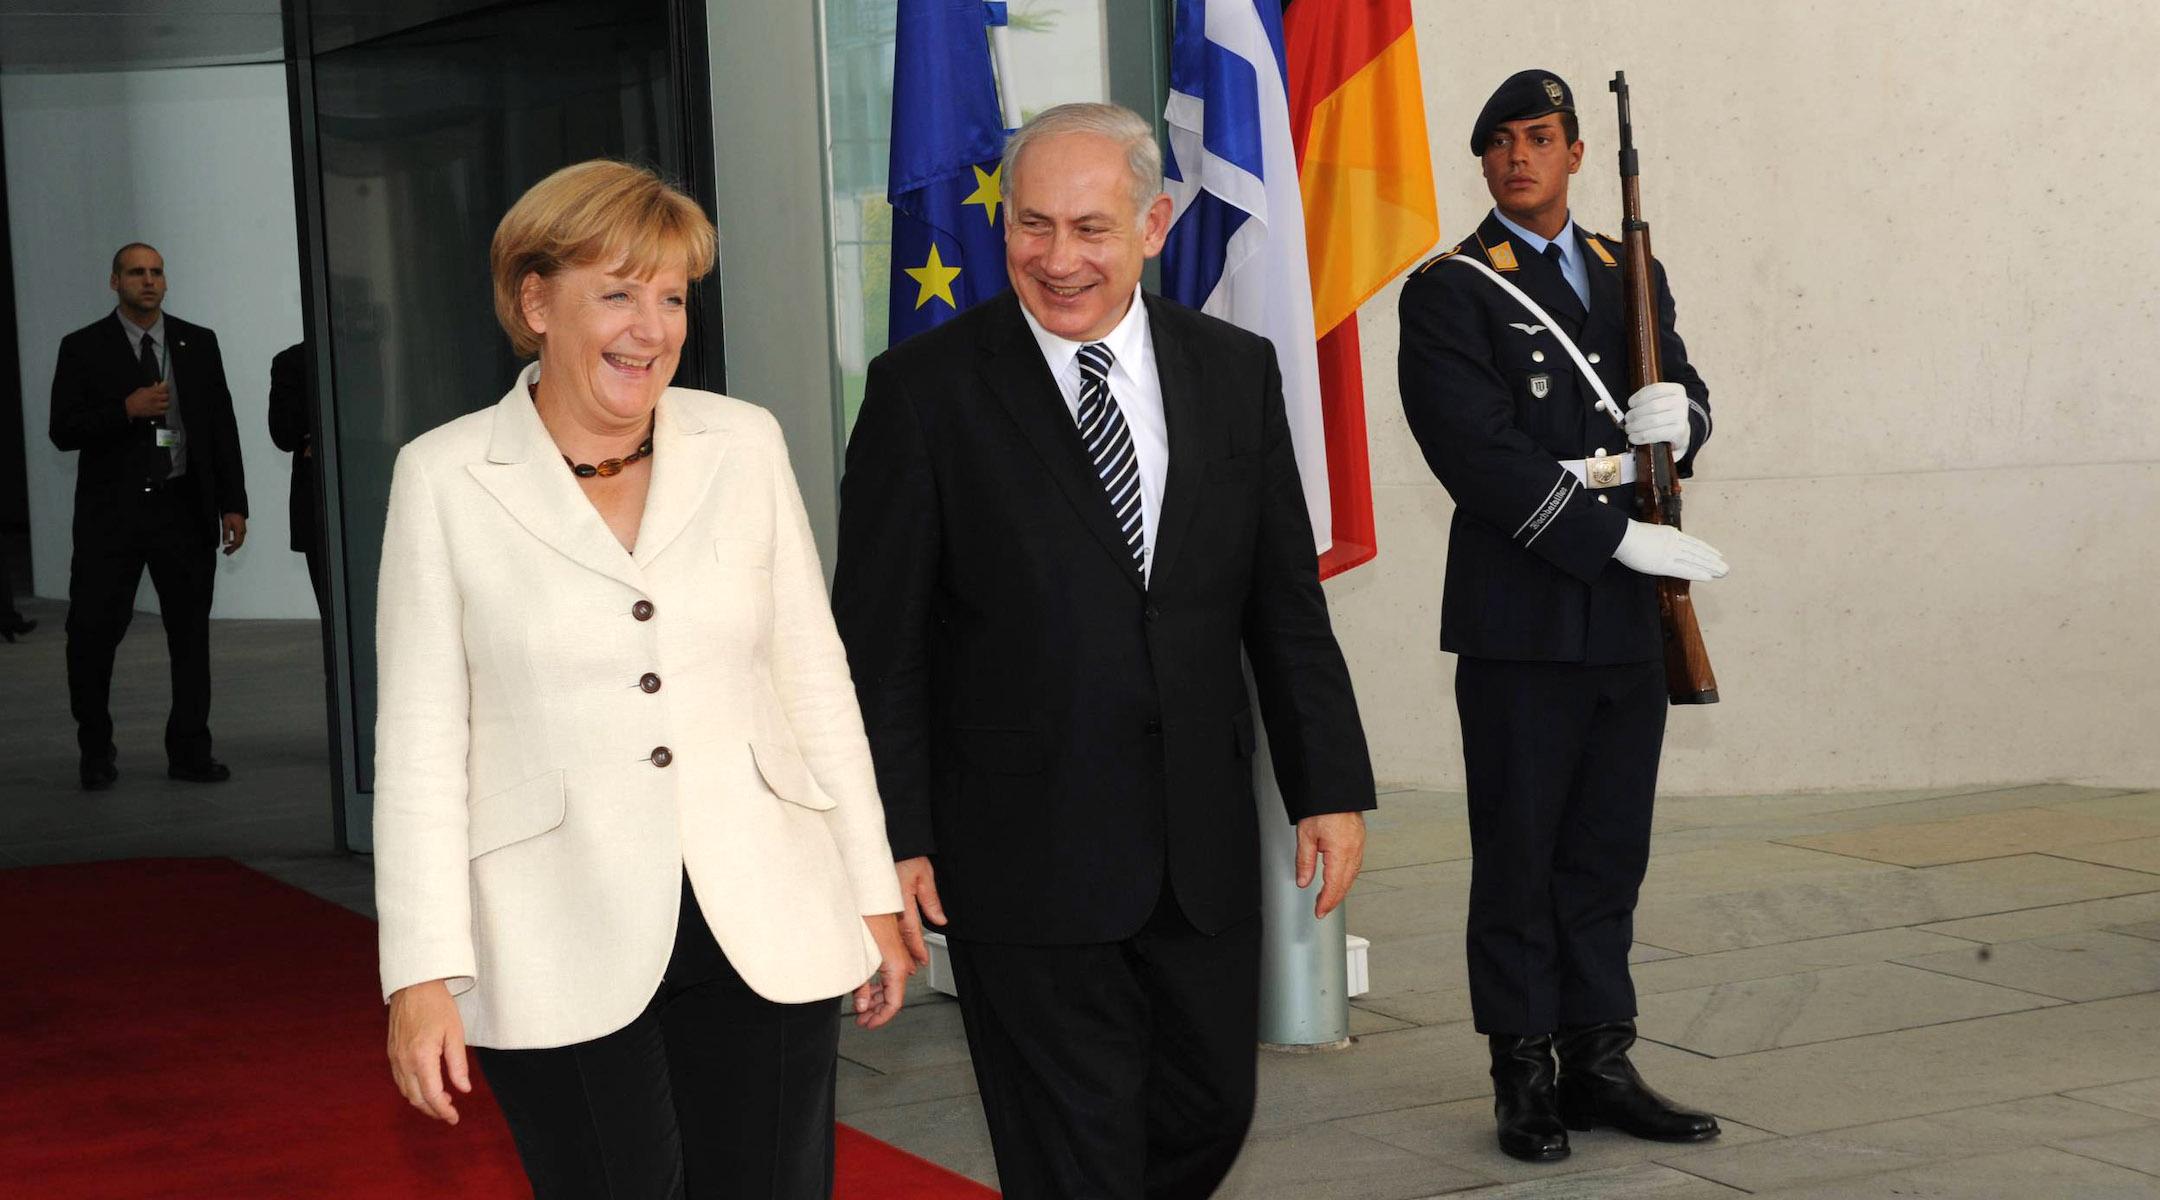 Angela Merkel meets with Benjamin Netanyahu